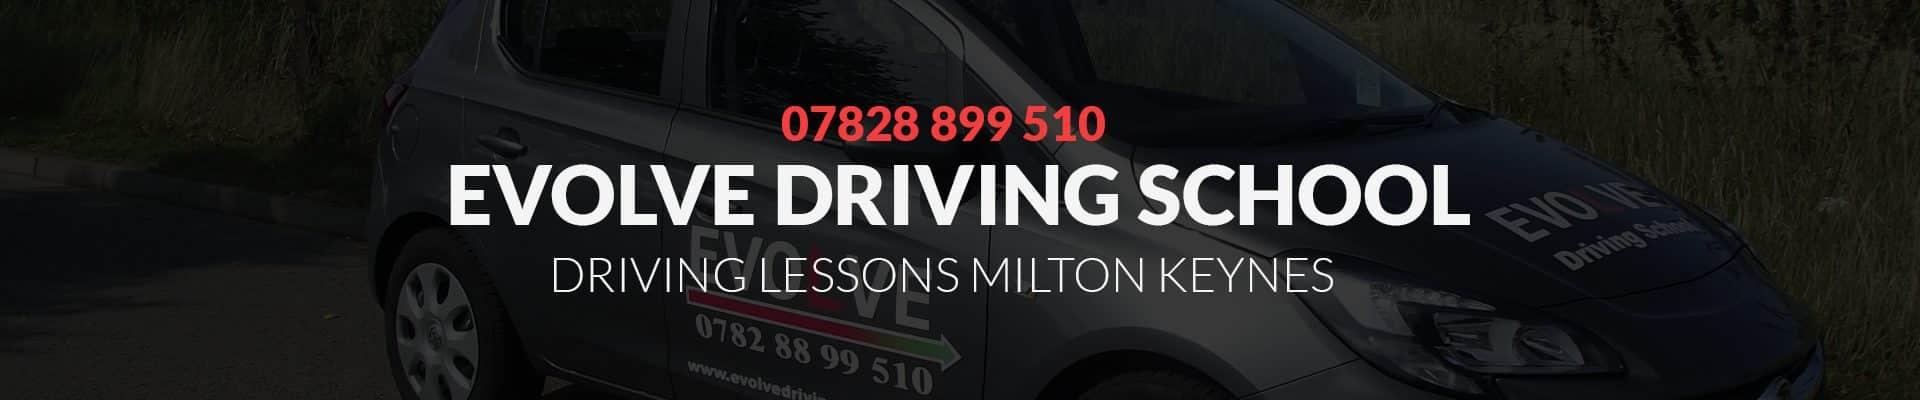 driving schools milton keynes banner